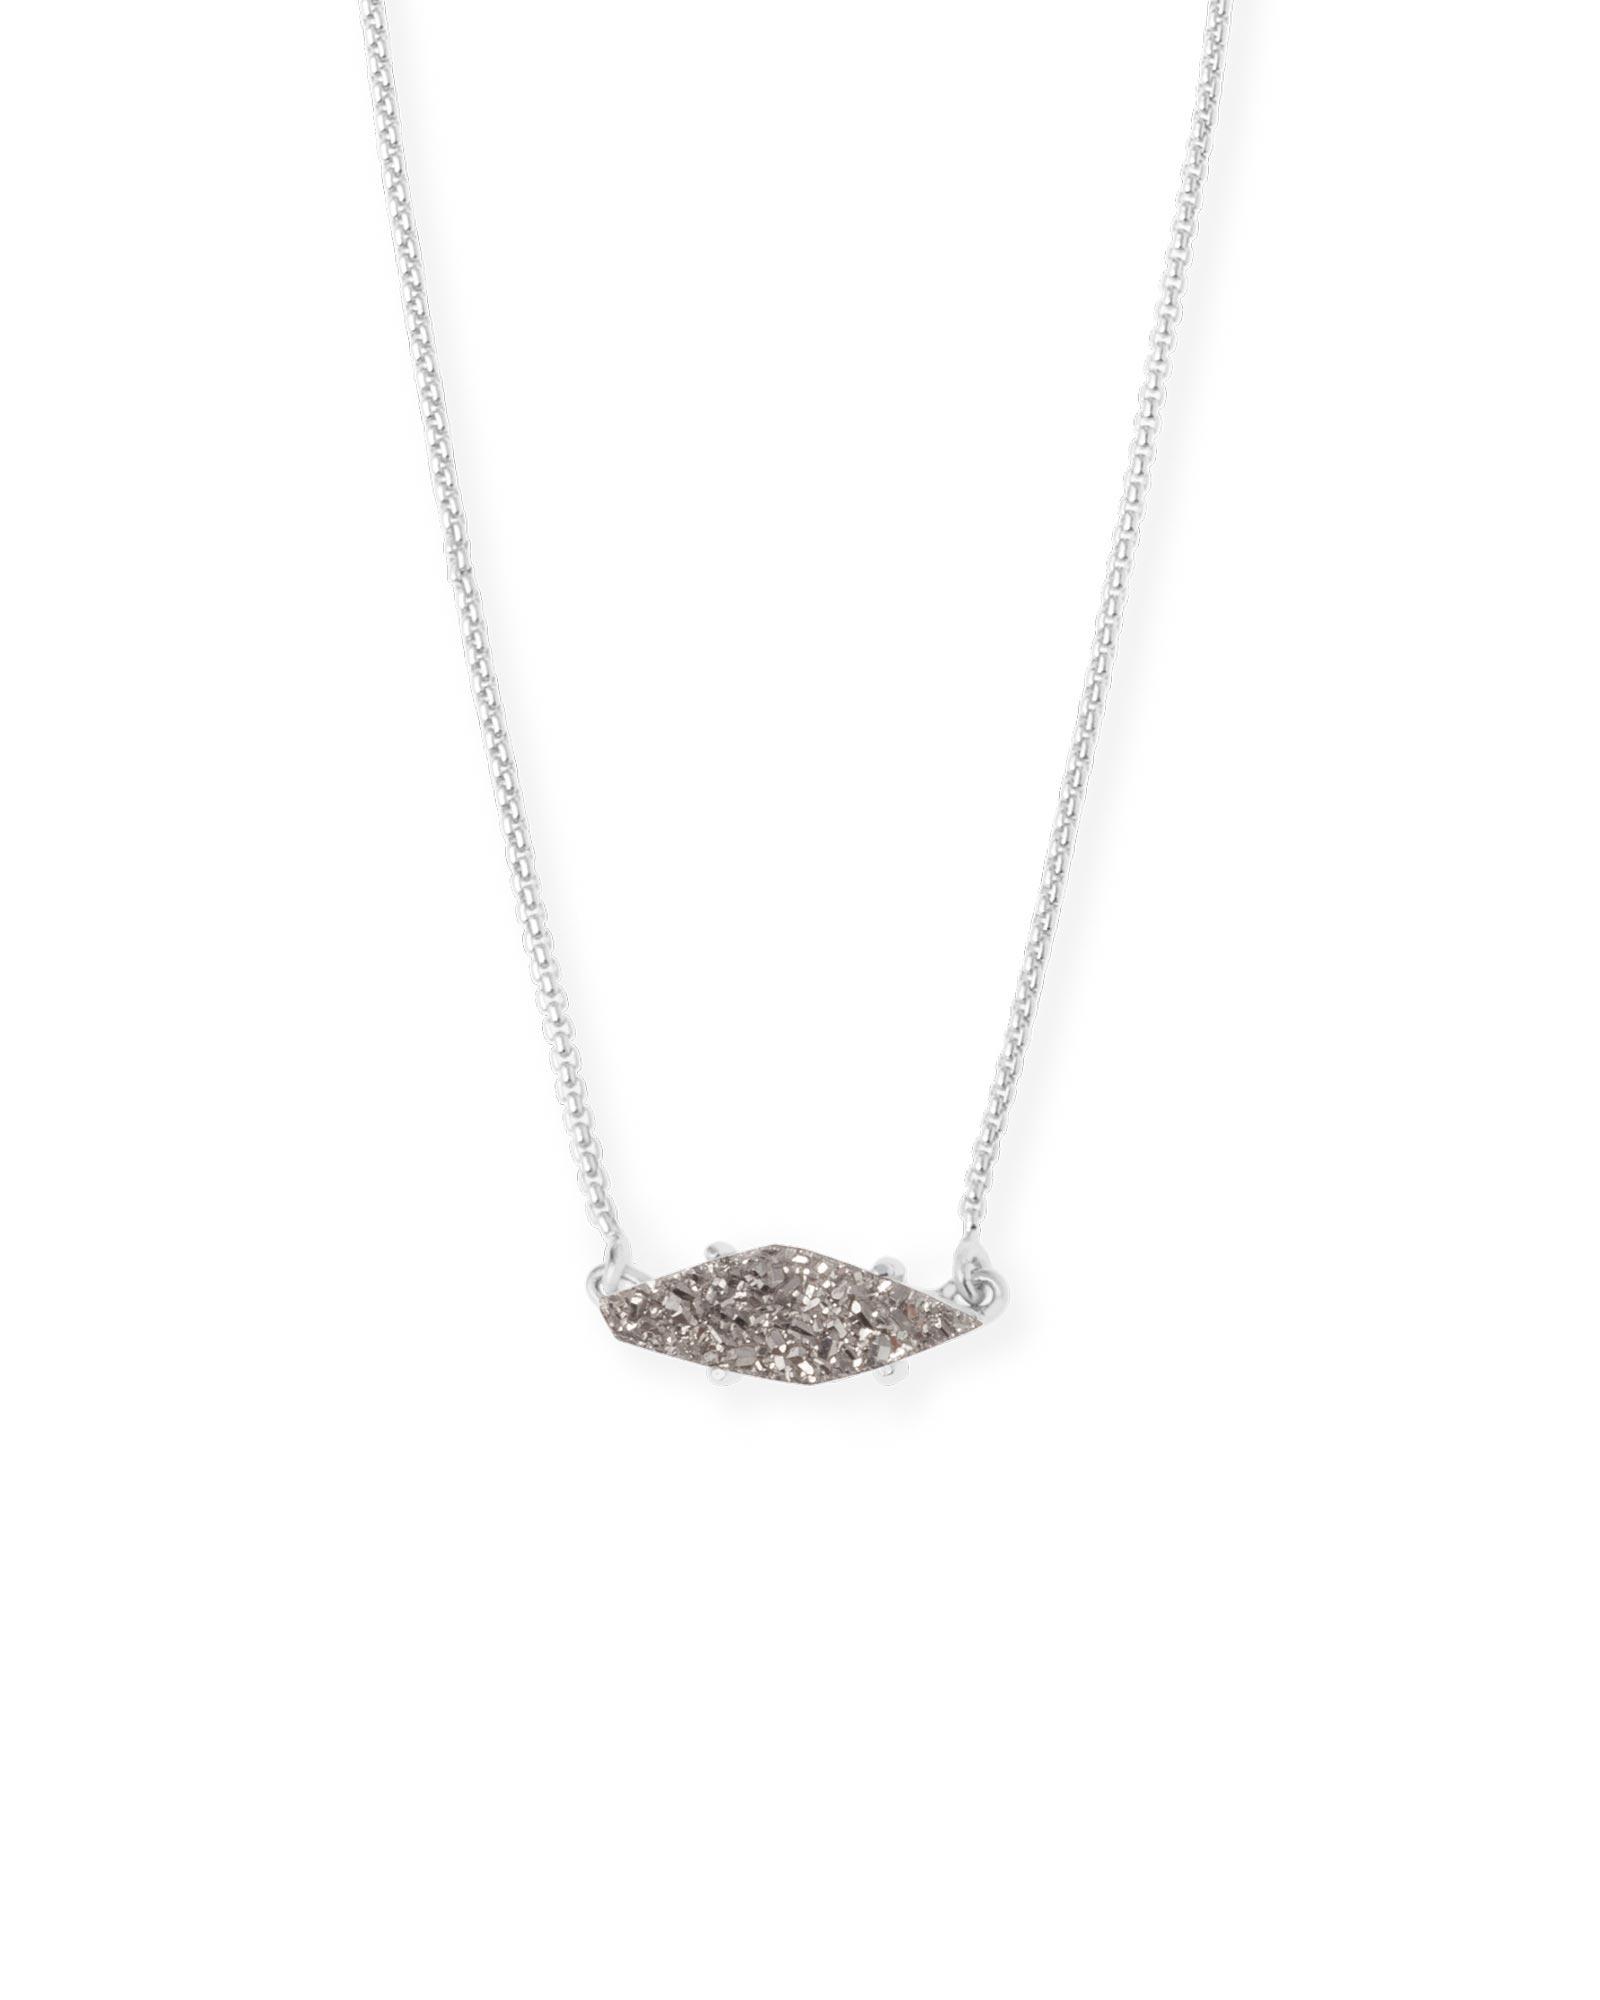 Bridgete silver pendant necklace in platinum kendra scott bridgete pendant necklace in platinum drusy aloadofball Images